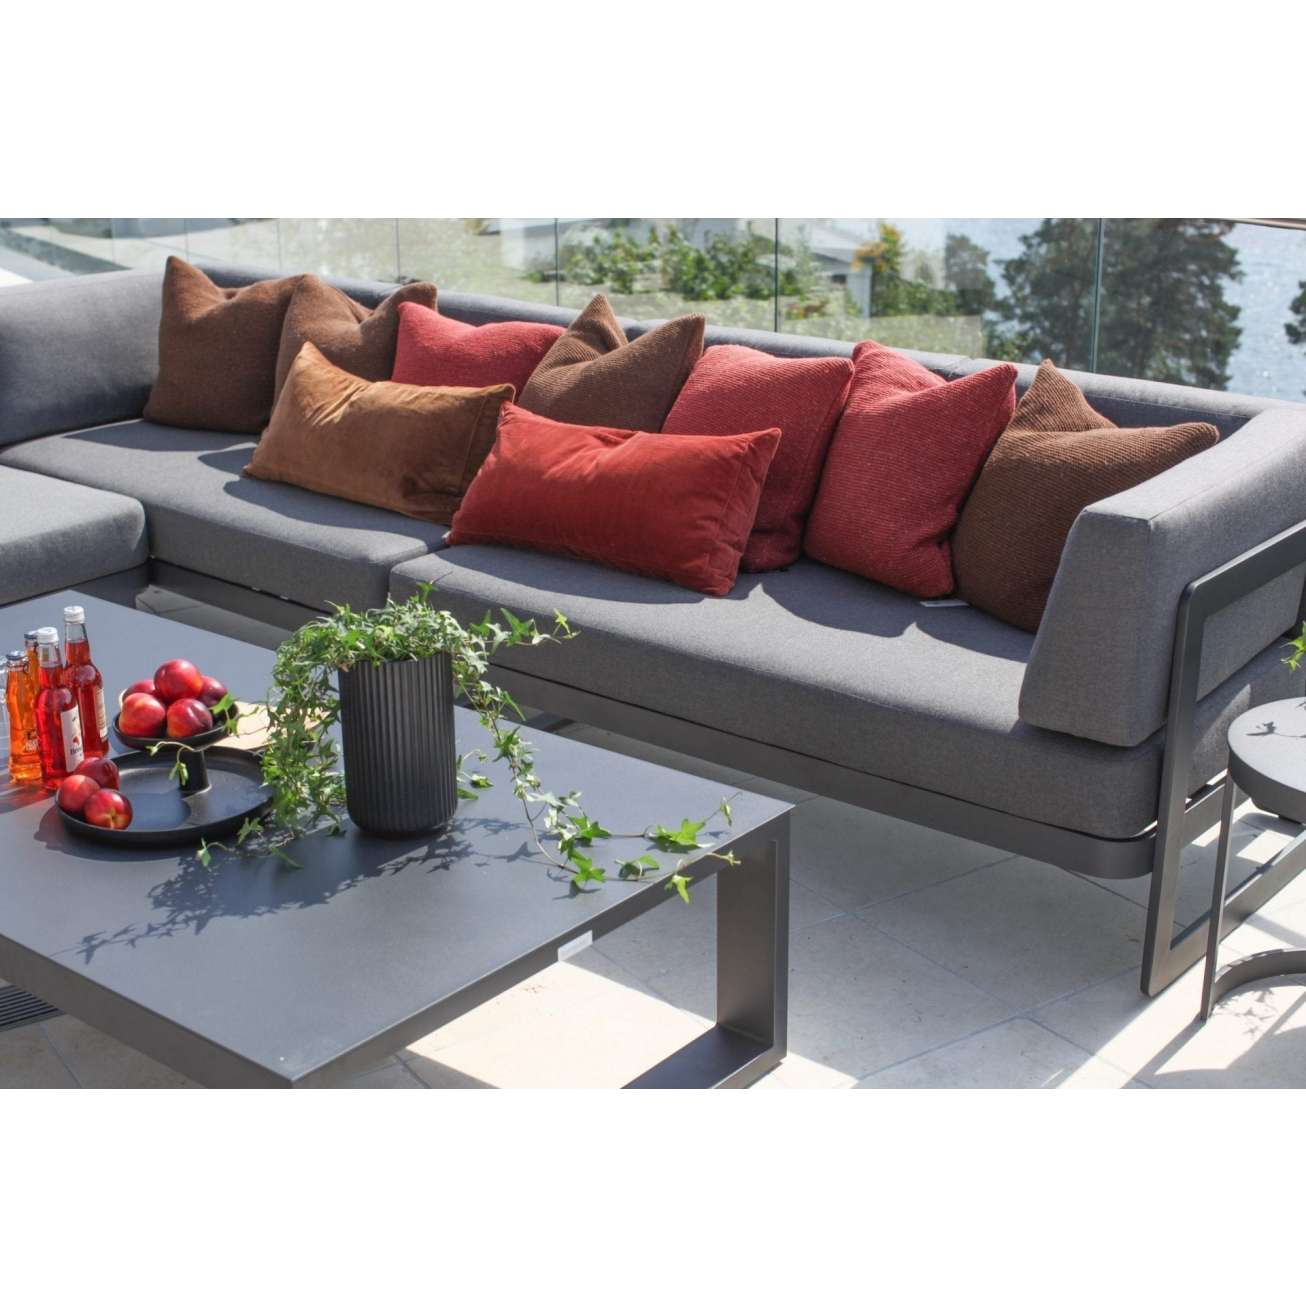 Hjørnesofa i sort aluminium med grå tekstil, pyntet med puter i flere farger og hagebord på terrasse i sollys